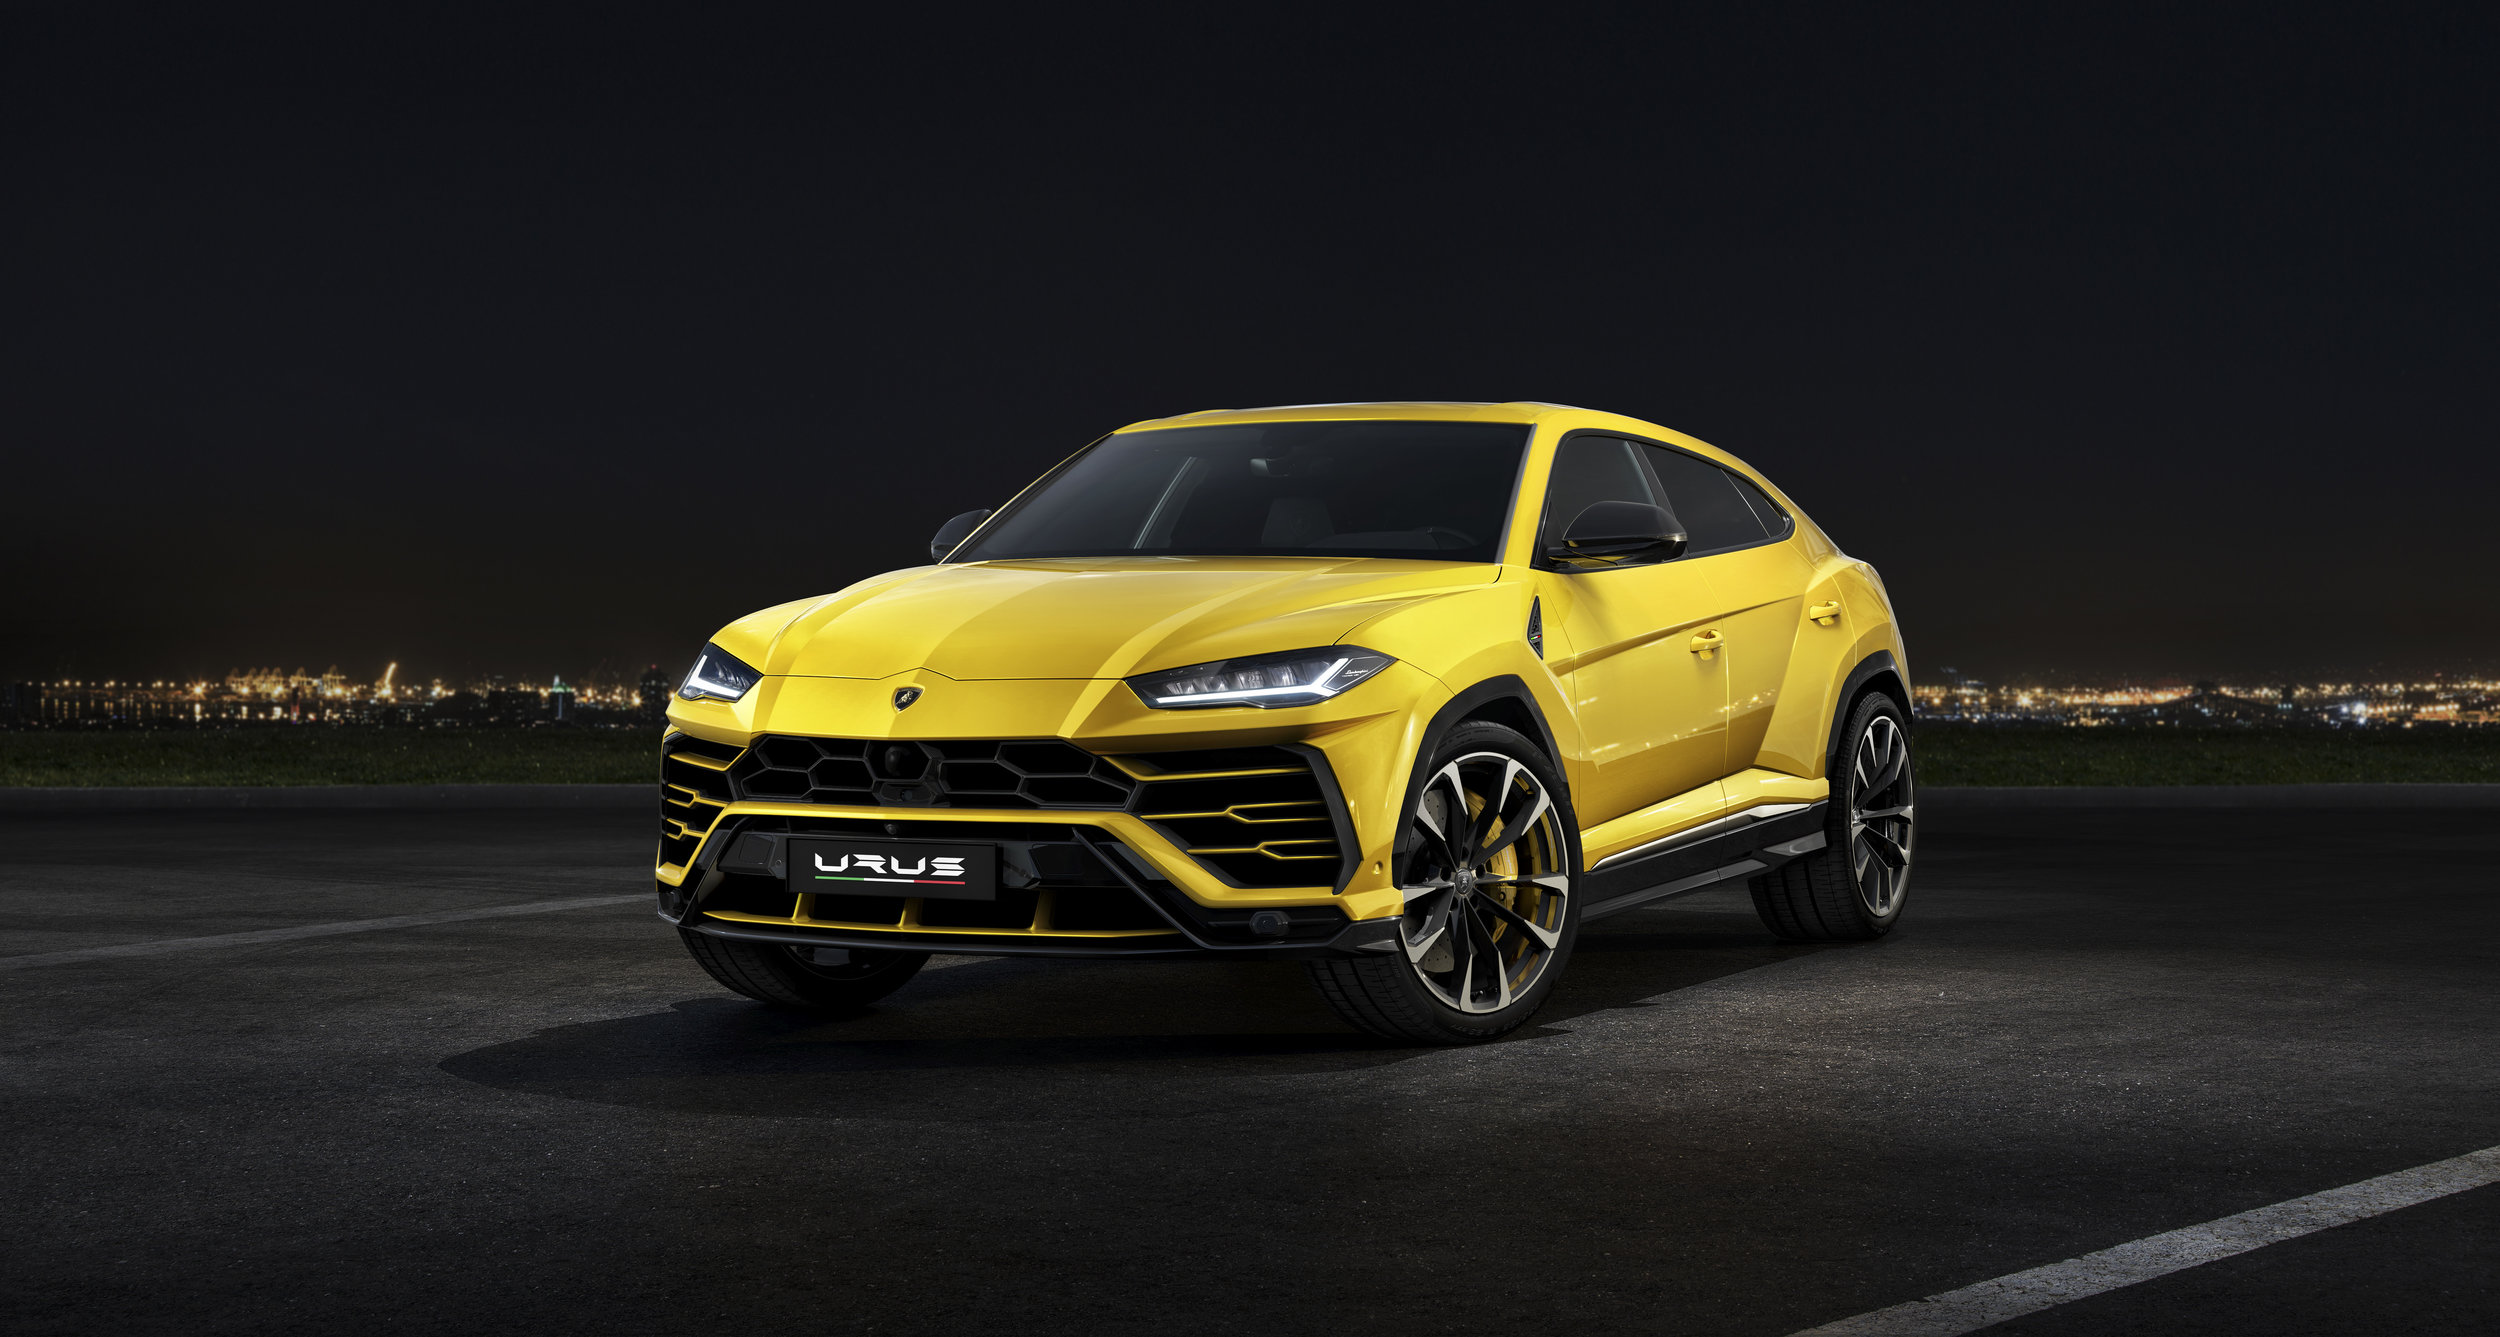 LamborghiniUrus.jpg